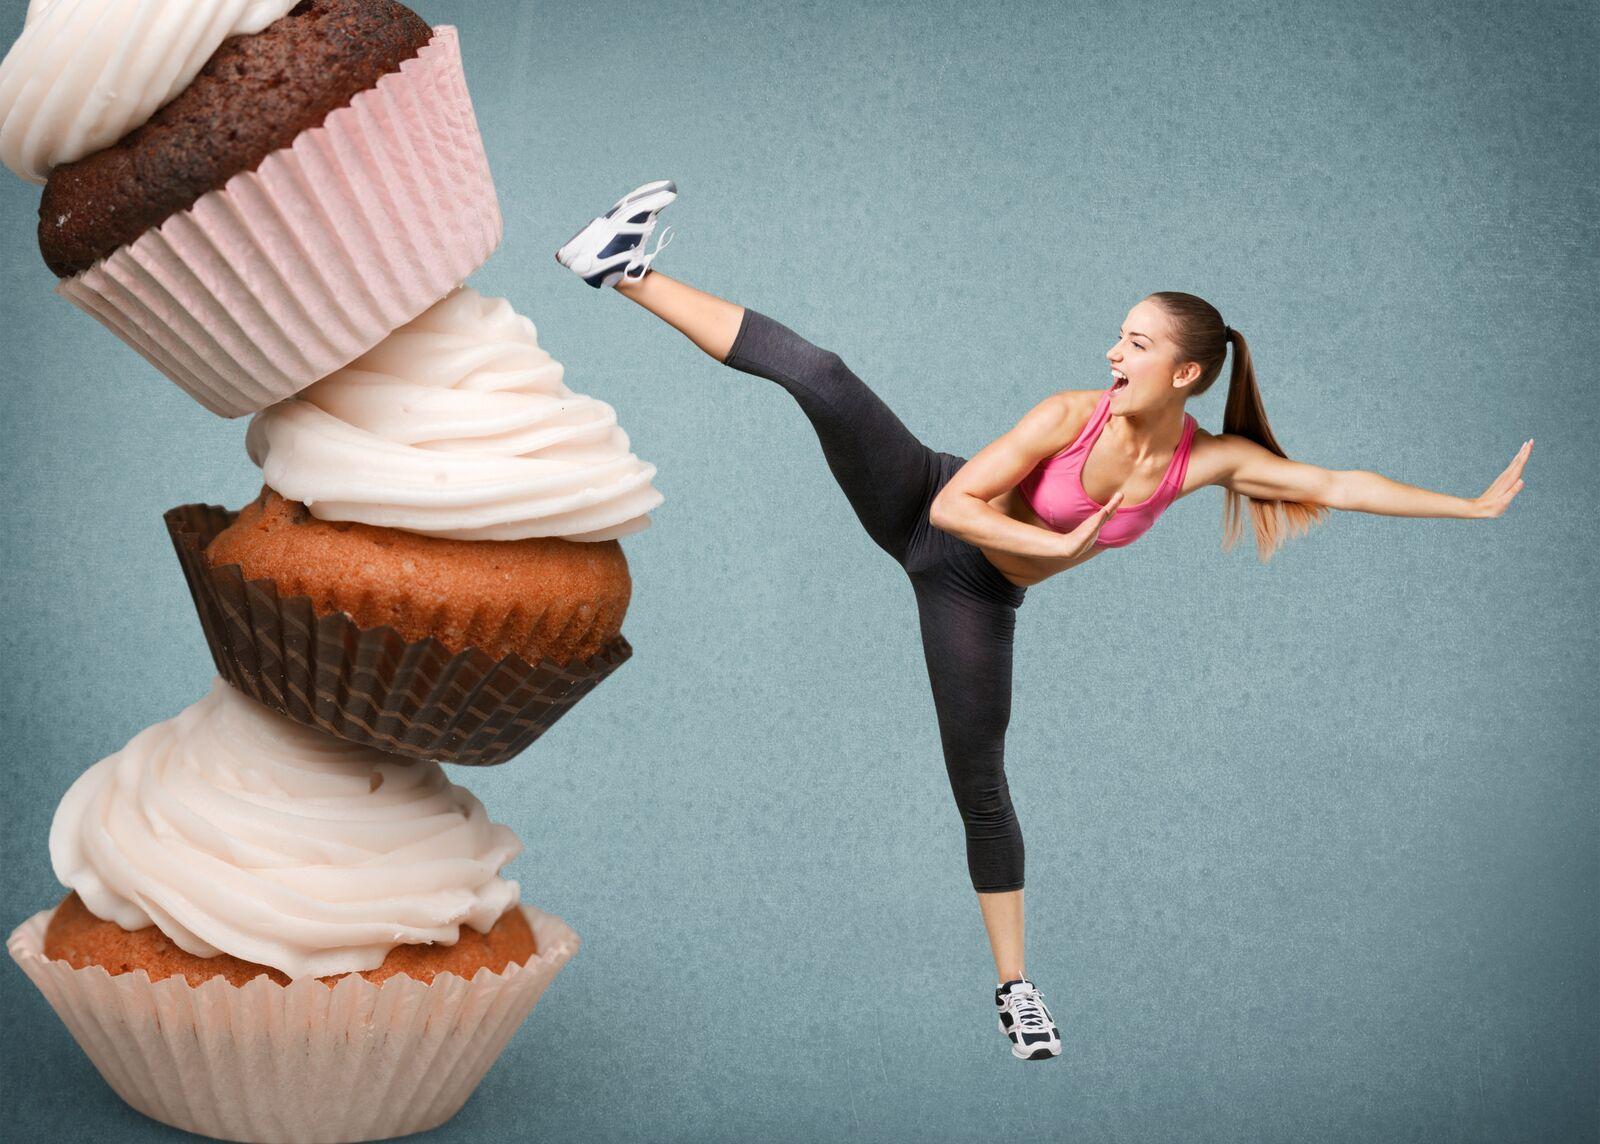 miti ginnastica dimagrimentofarmacia san carlo secondigliano